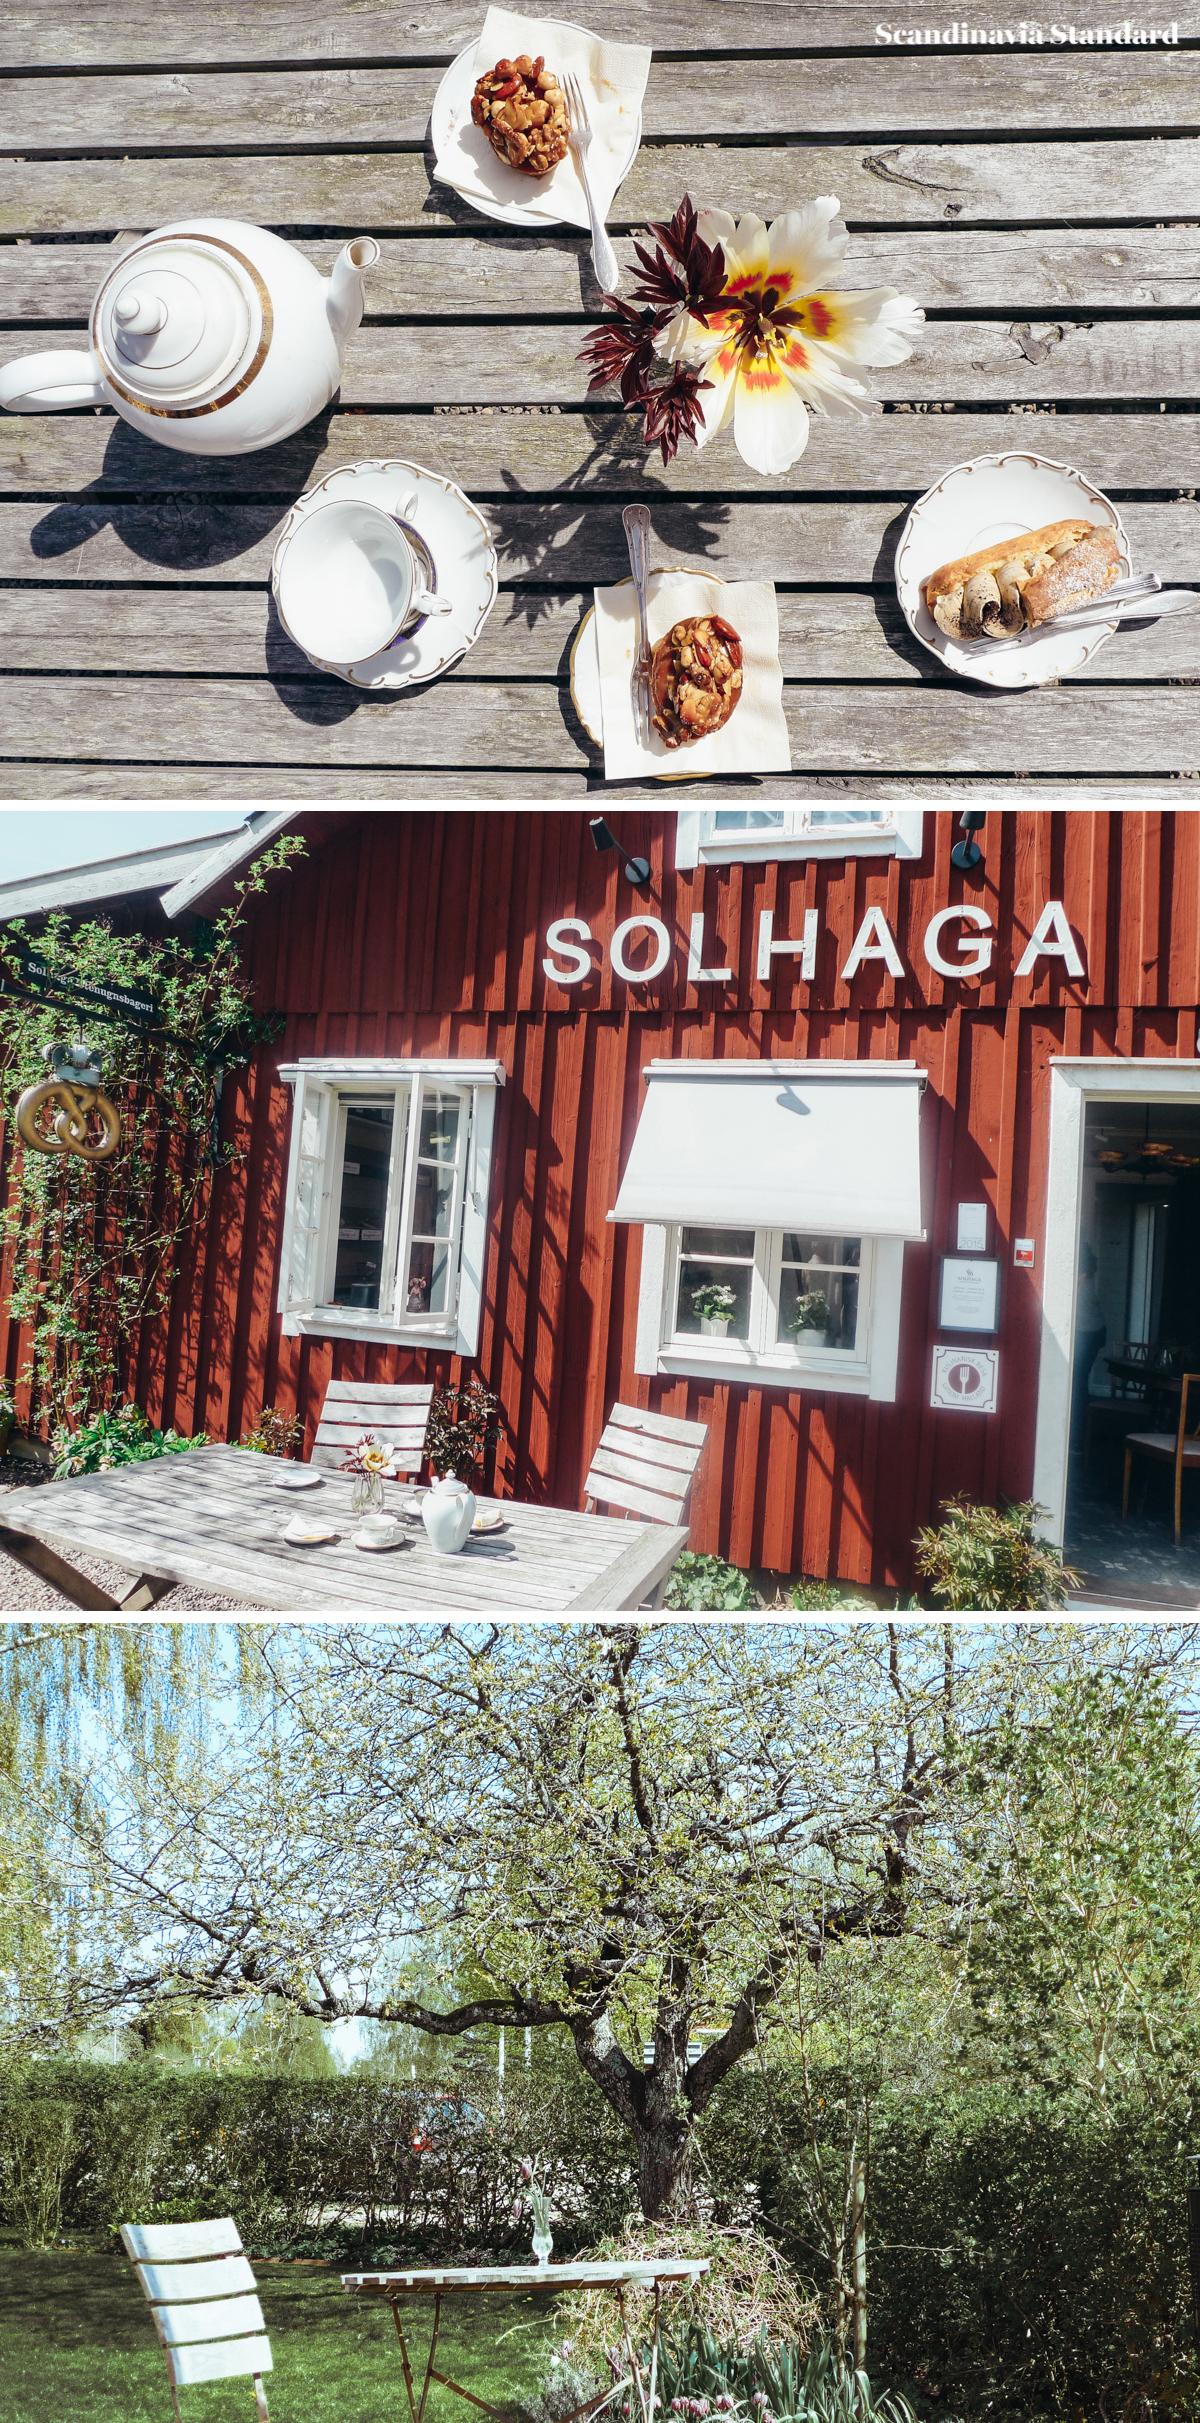 Solhaga Stenungnsbageri Outside | Scandinavia Standard